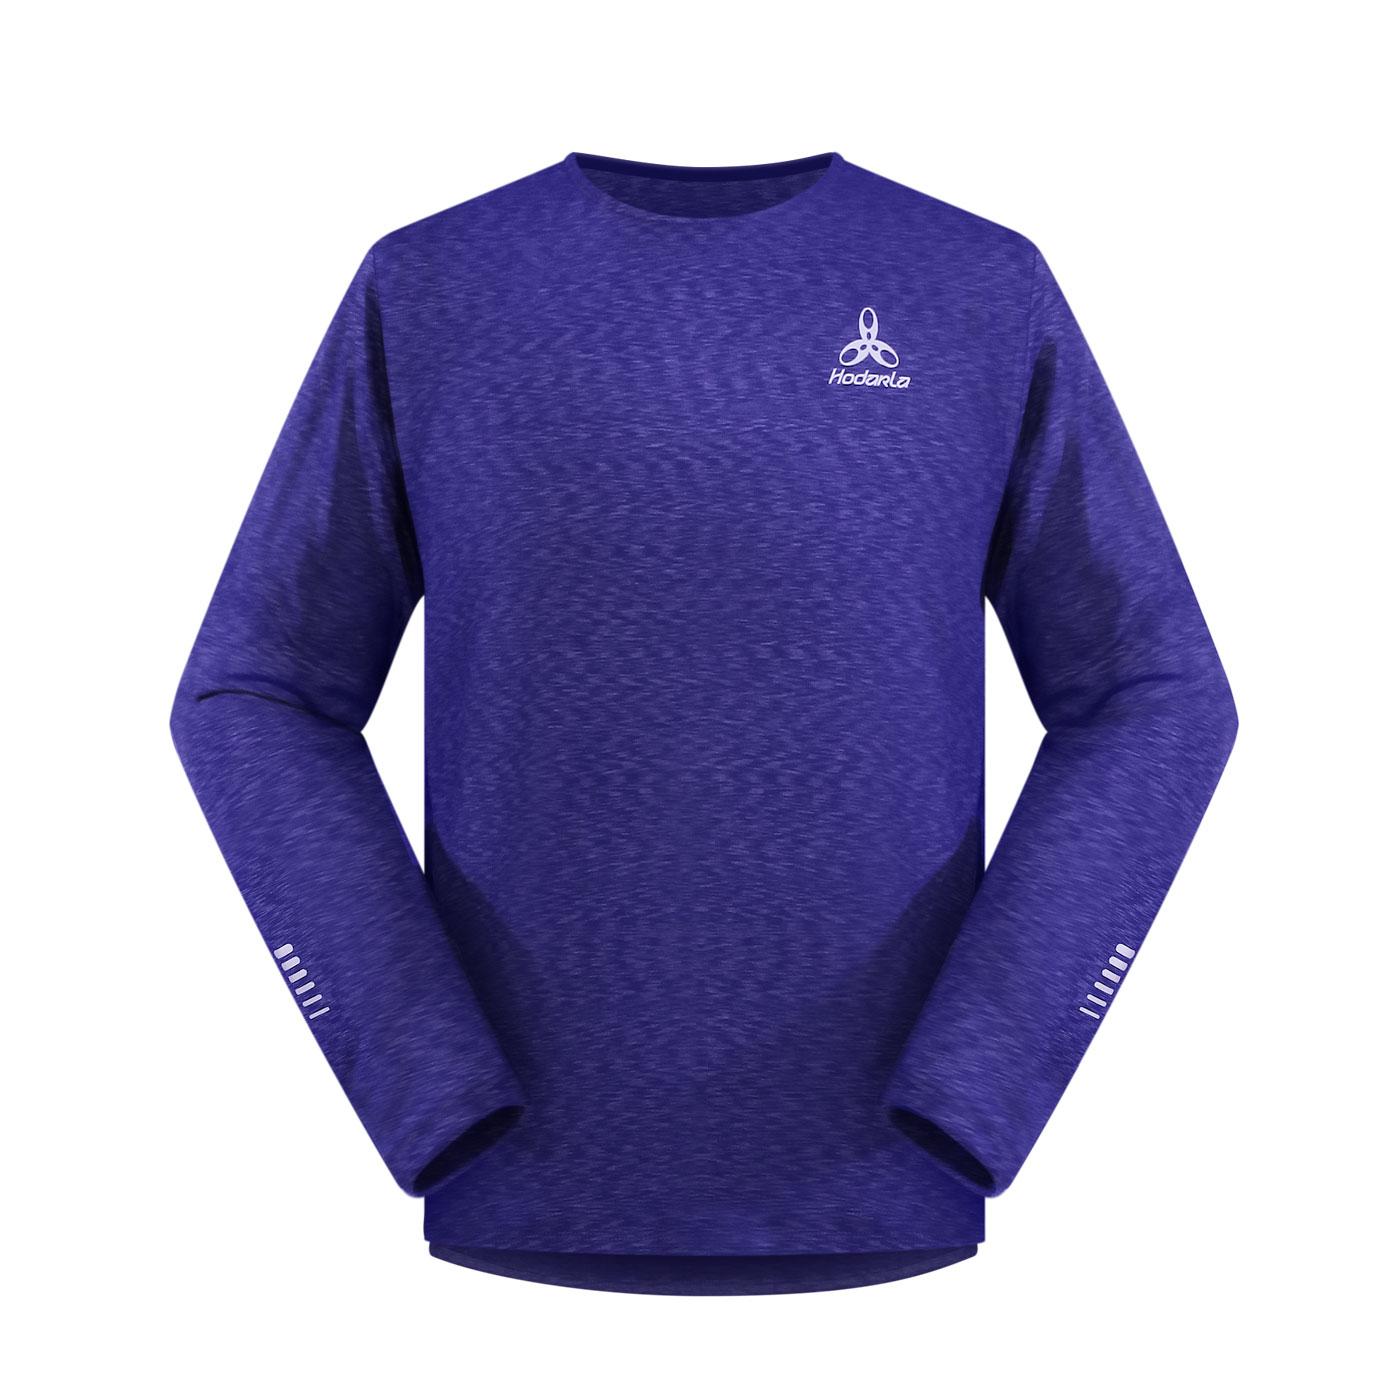 HODARLA 辰風保暖長袖T恤 3161401 - 麻花藍